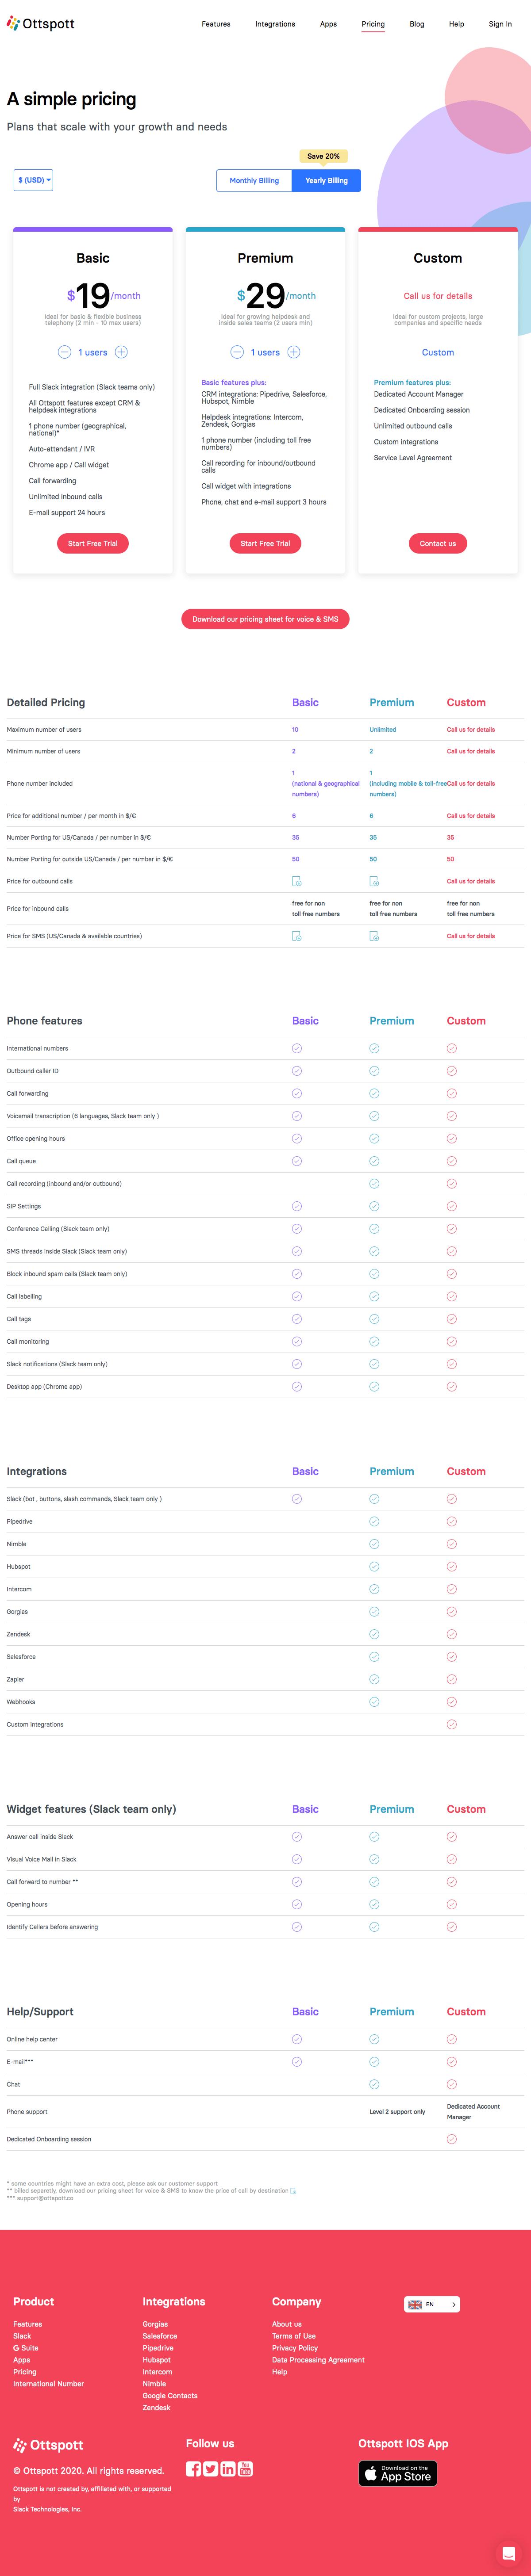 Ottspott – Pricing page